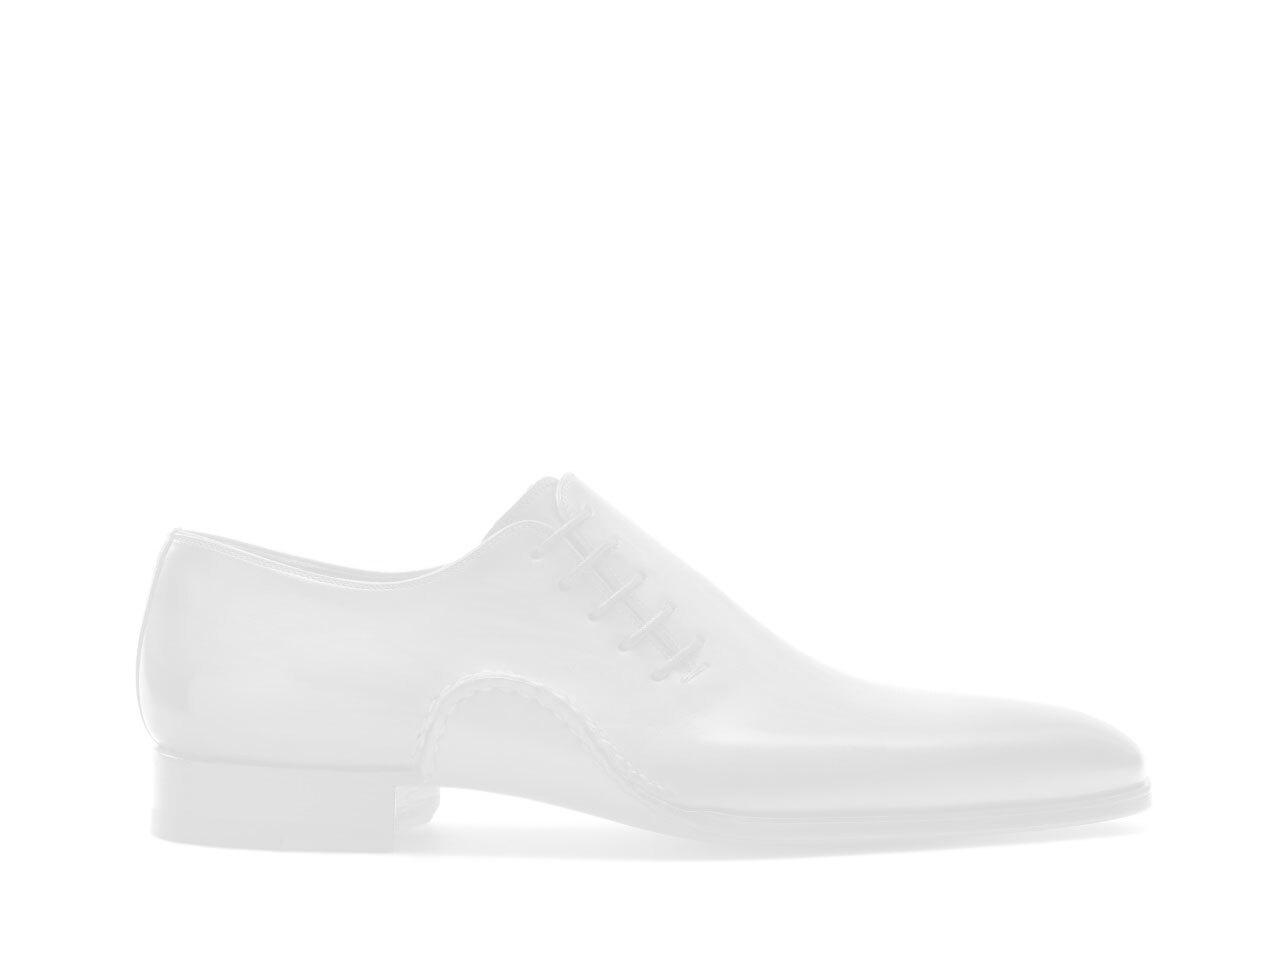 Casual Sock | Charcoal Grey